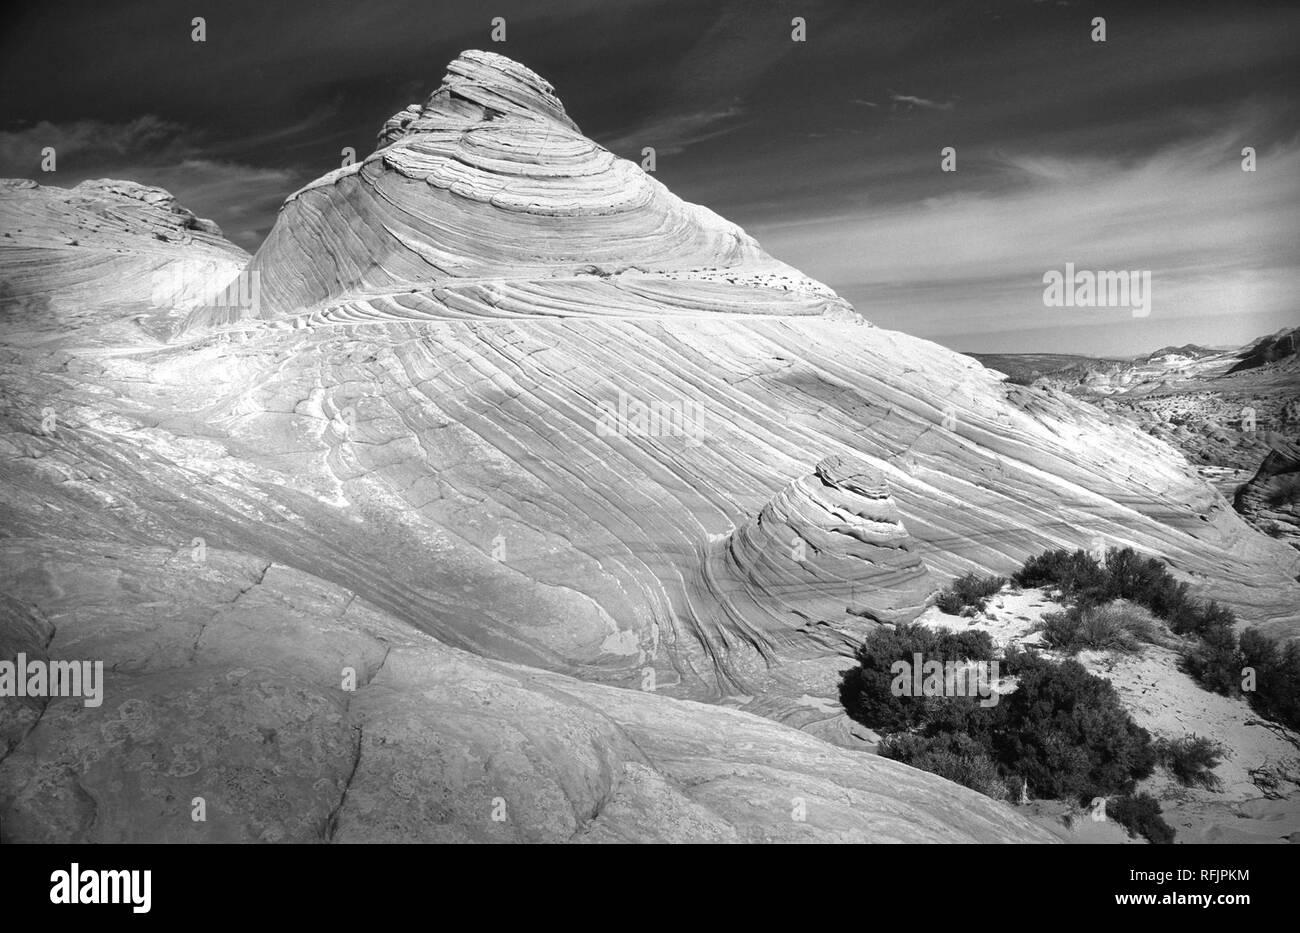 AZ - The Wave, Paria Canyon Wilderness, Mar 1987 -BW (1) (10469004234). - Stock Image